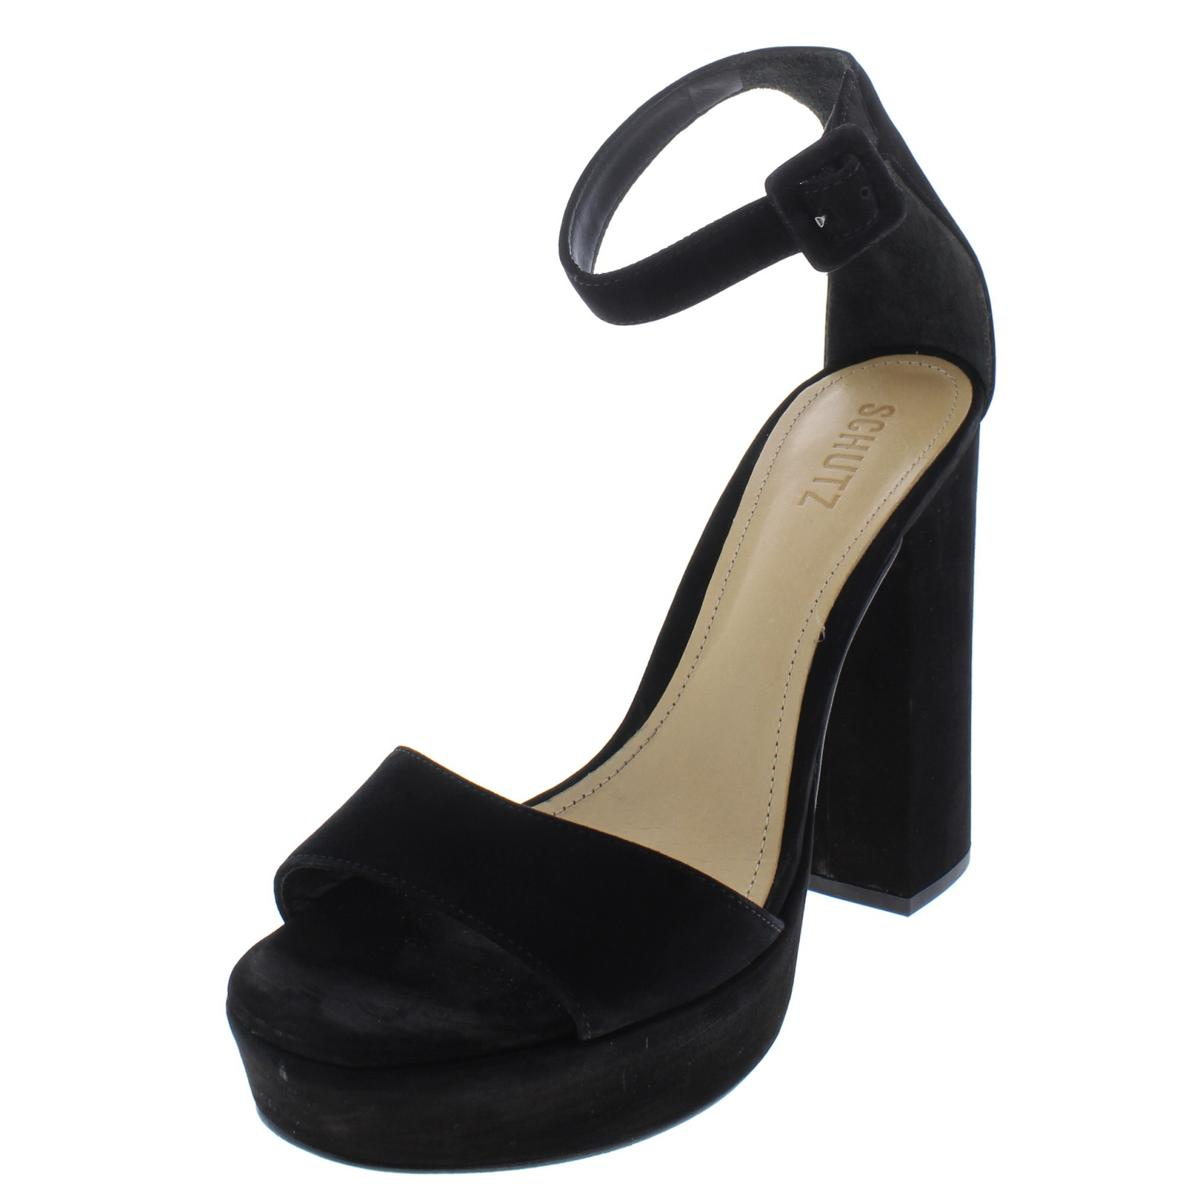 Schutz Womens Mikella Suede Heels Open Toe Dress Sandals shoes BHFO 7688